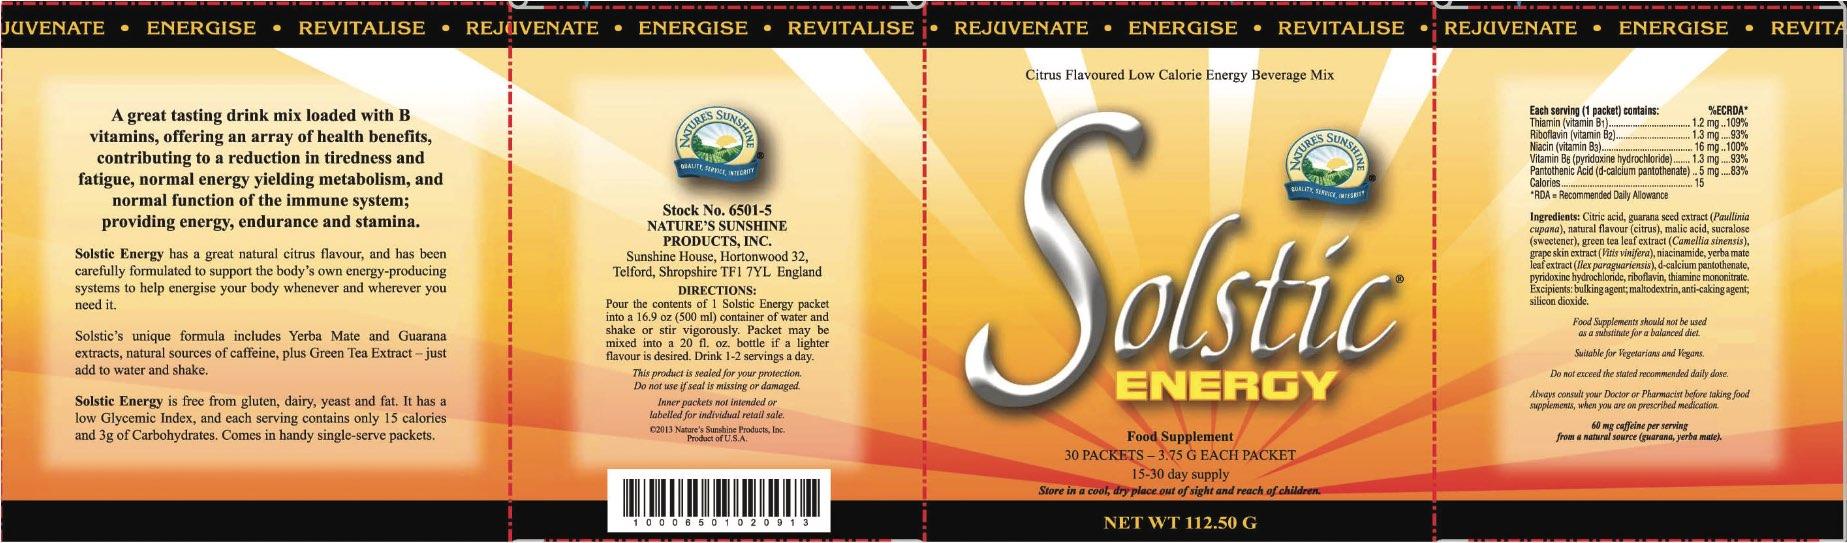 Nature's Sunshine - Solstic Energy (30 Sachets) - Label